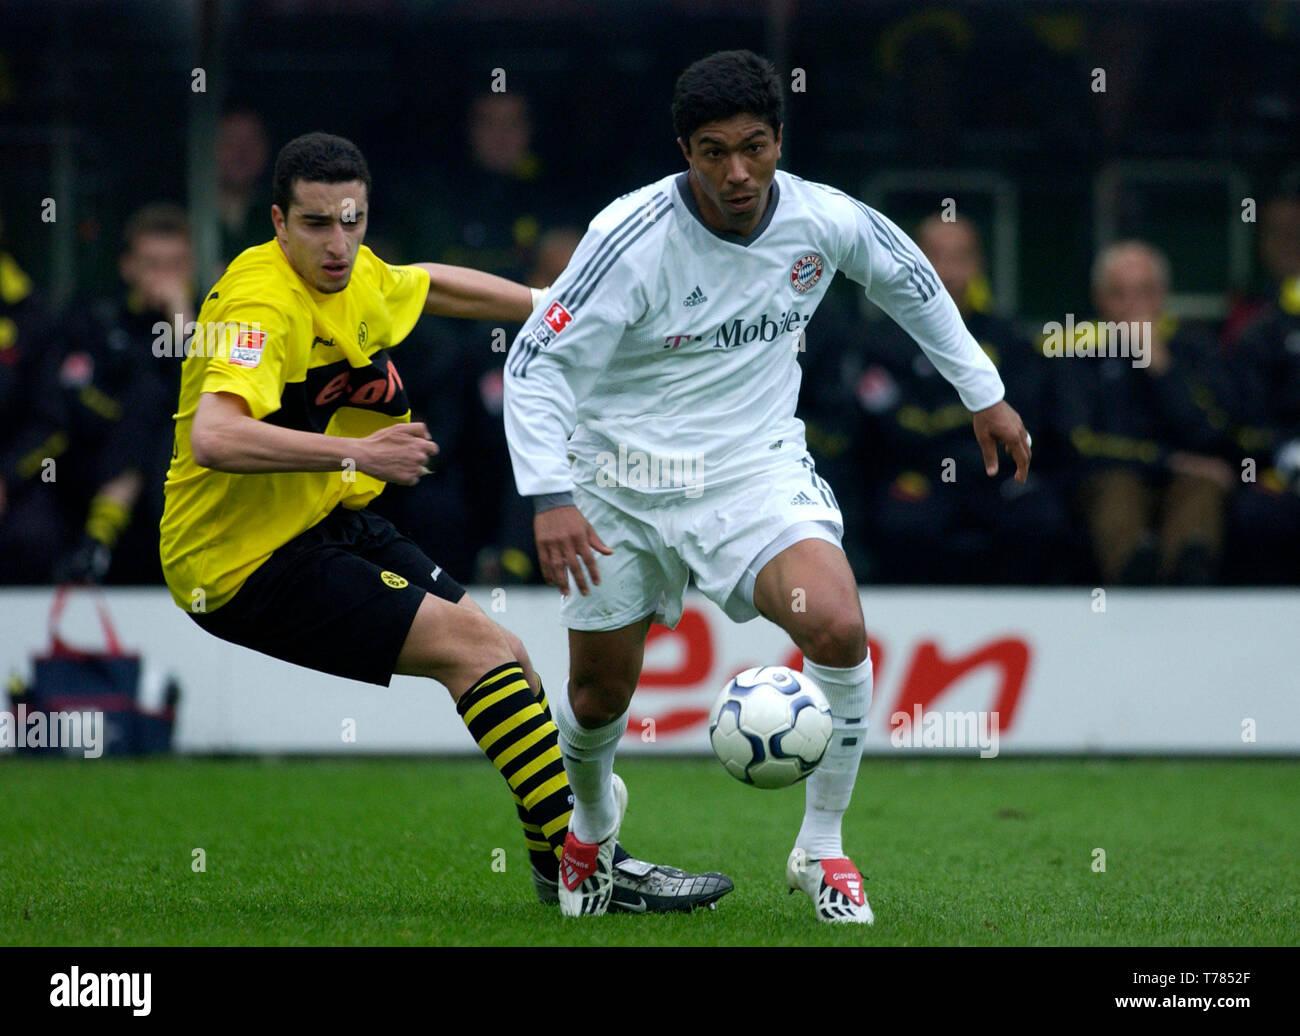 Westfalenstadion Dortmund Germany, 19.4.2003, German Football Bundesliga Season 2002/03, matchday 29, Borussia Dortmund (yellow) vs Bayern Munich (white) --- Giovane Elber (FCB), Ahmed Mahdouni (BVB) - Stock Image